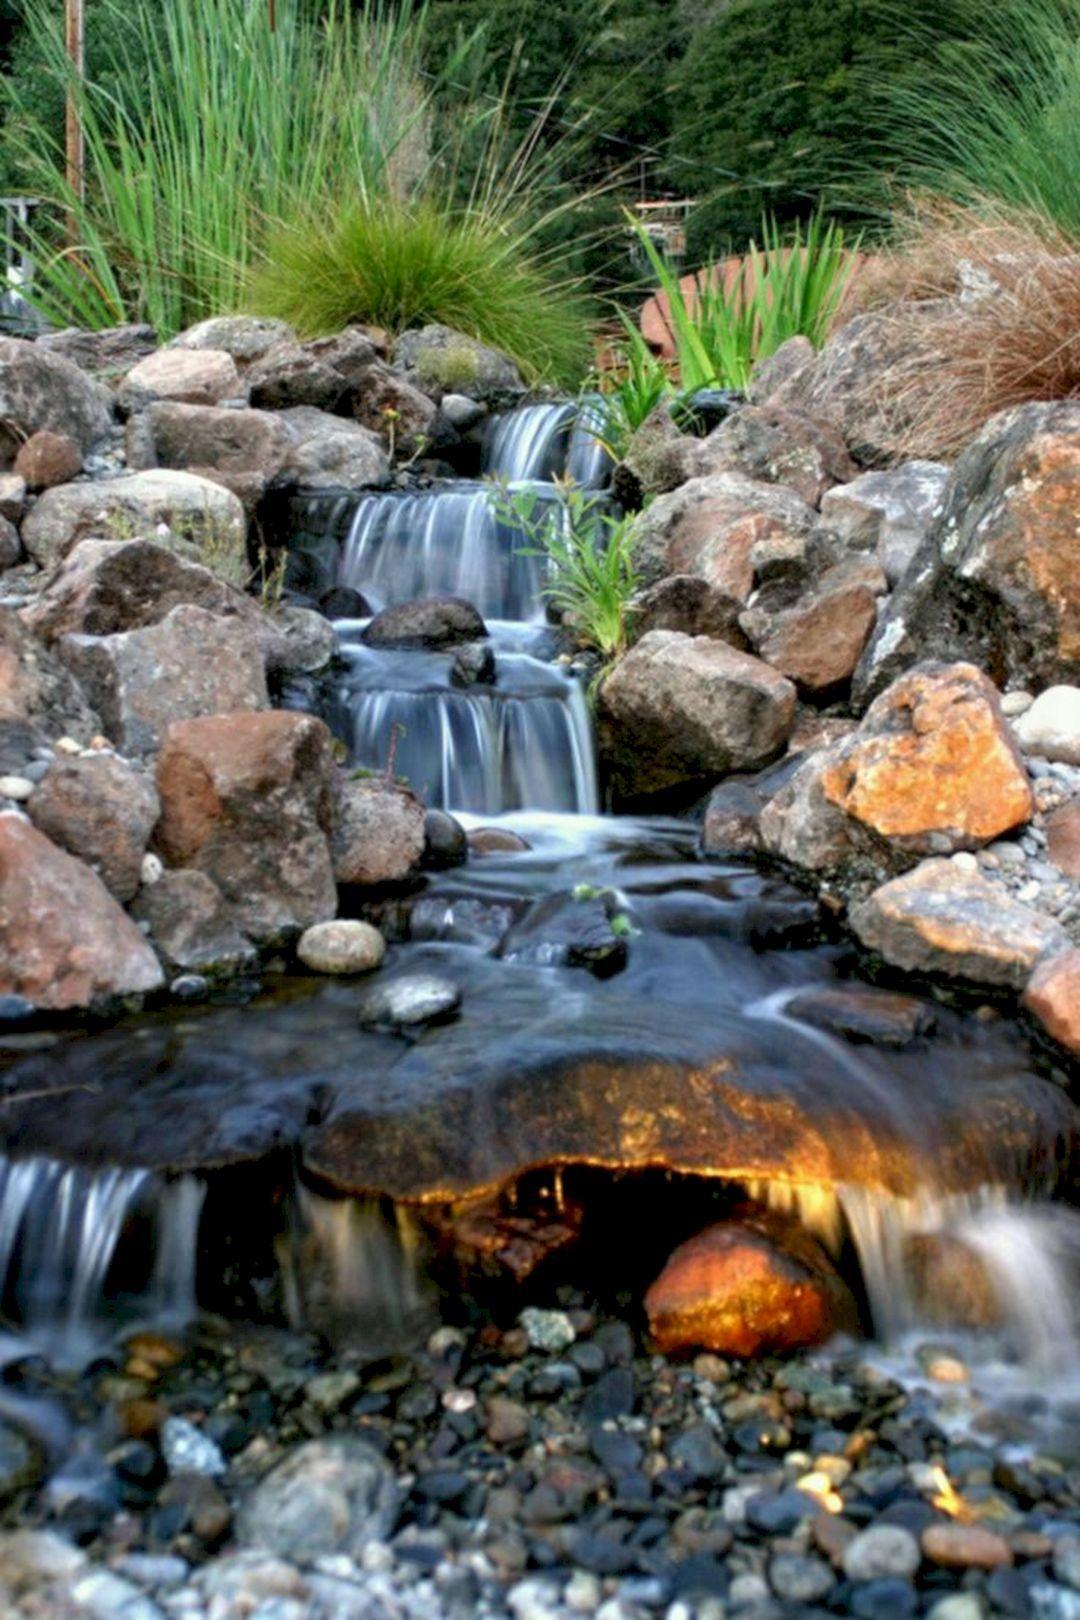 Adorable 25 Best And Wonderful Backyard Waterfall Design Ideas Https Teracee Com Backyard Ideas 25 Best A Waterfalls Backyard Ponds Backyard Garden Waterfall